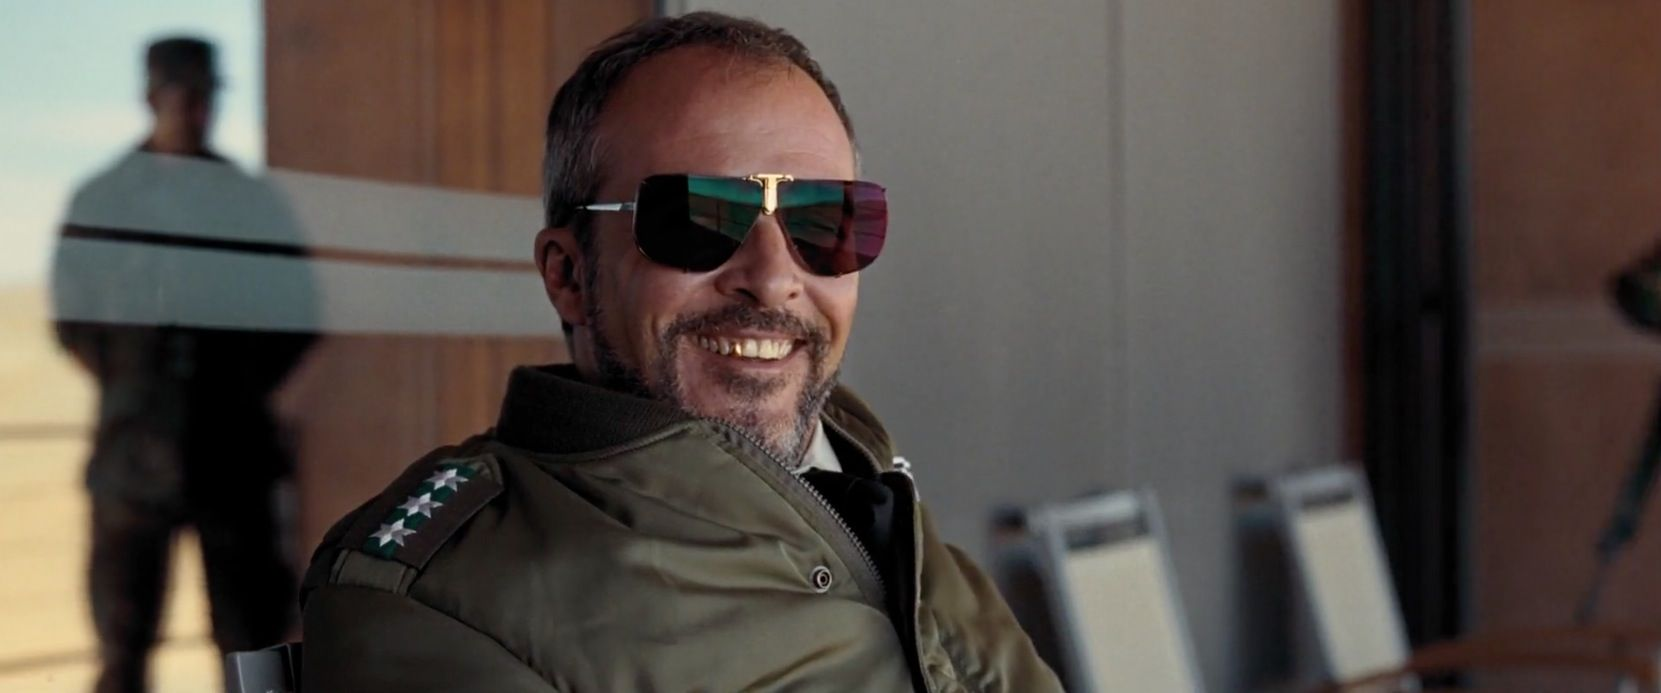 3d5fc88d3df91 Boris Becker by Polaroid 4804C sunglasses worn by Fernando Guillén Cuervo  in QUANTUM OF SOLACE (2008)  polaroid